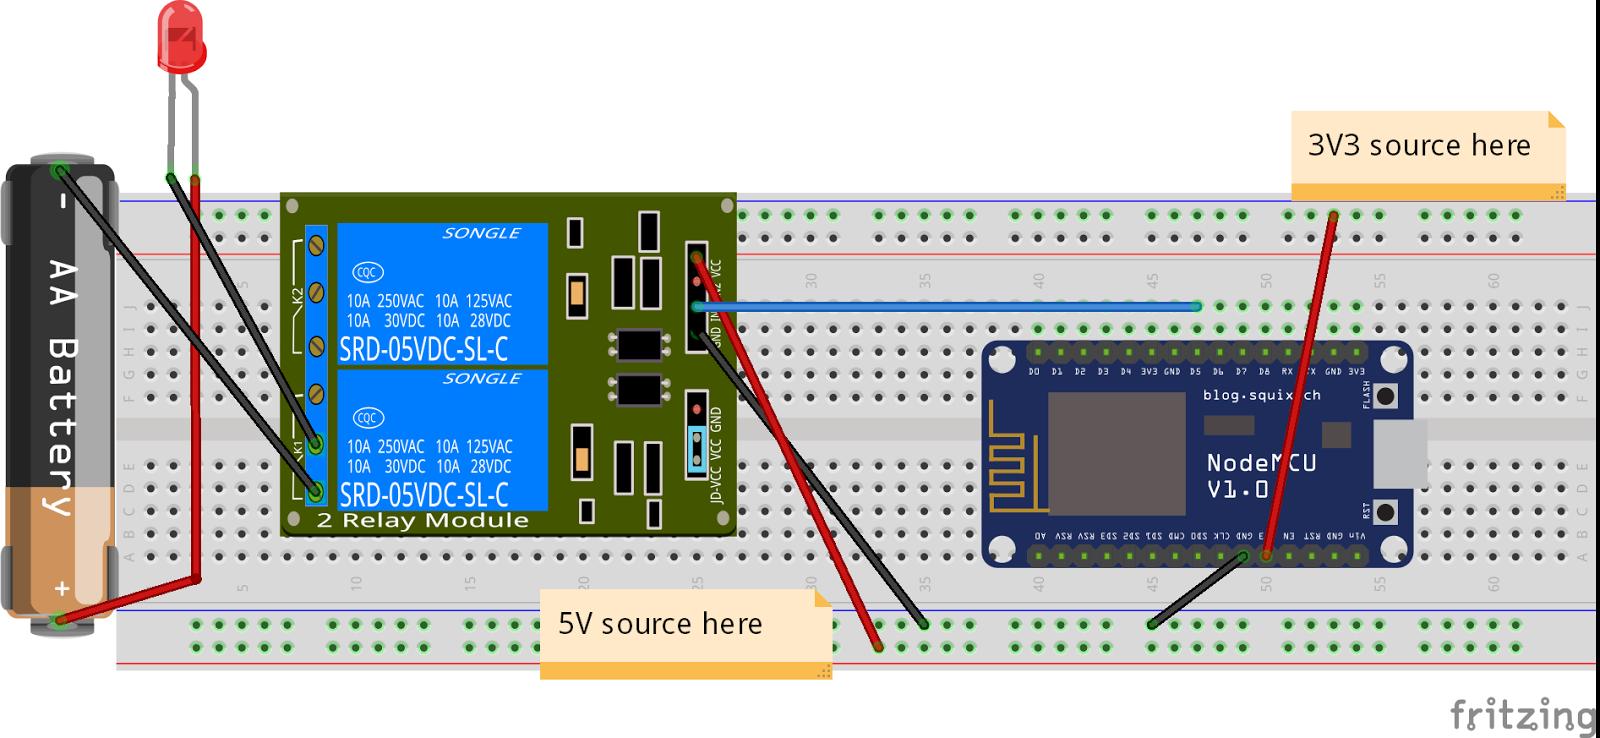 Internet Controlled Switch Using Nodemcu And Mqtt Relay 5 Pin Fritzing Circuit Setup